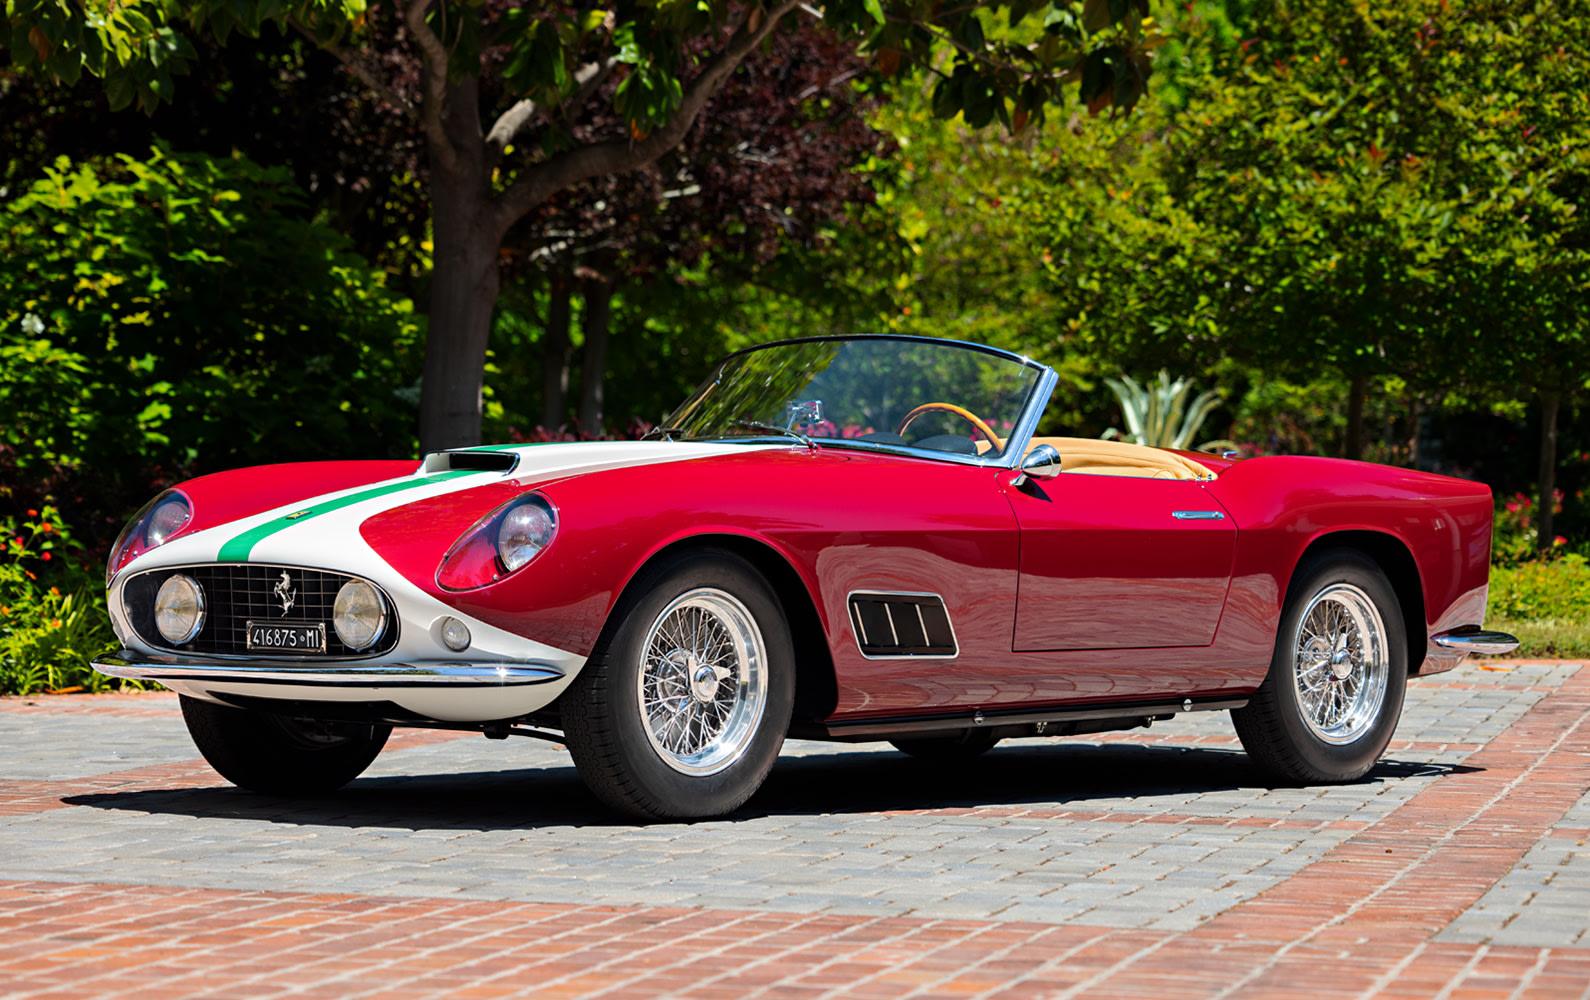 1959 Ferrari 250 GT LWB California Spider Competizione (1)